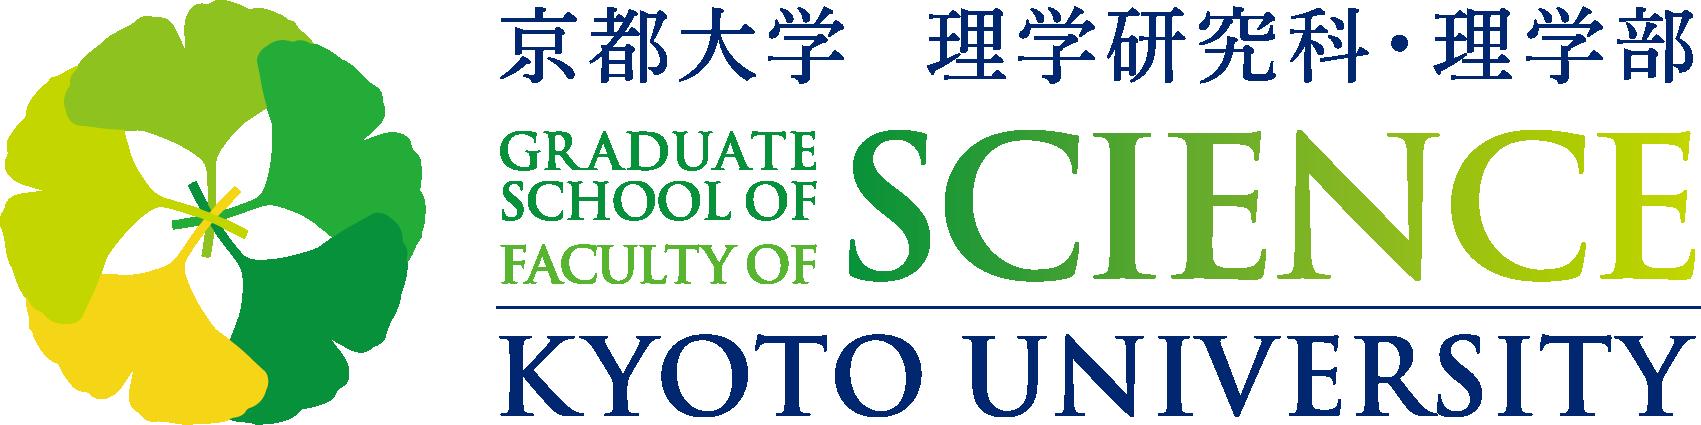 logo of School of Science